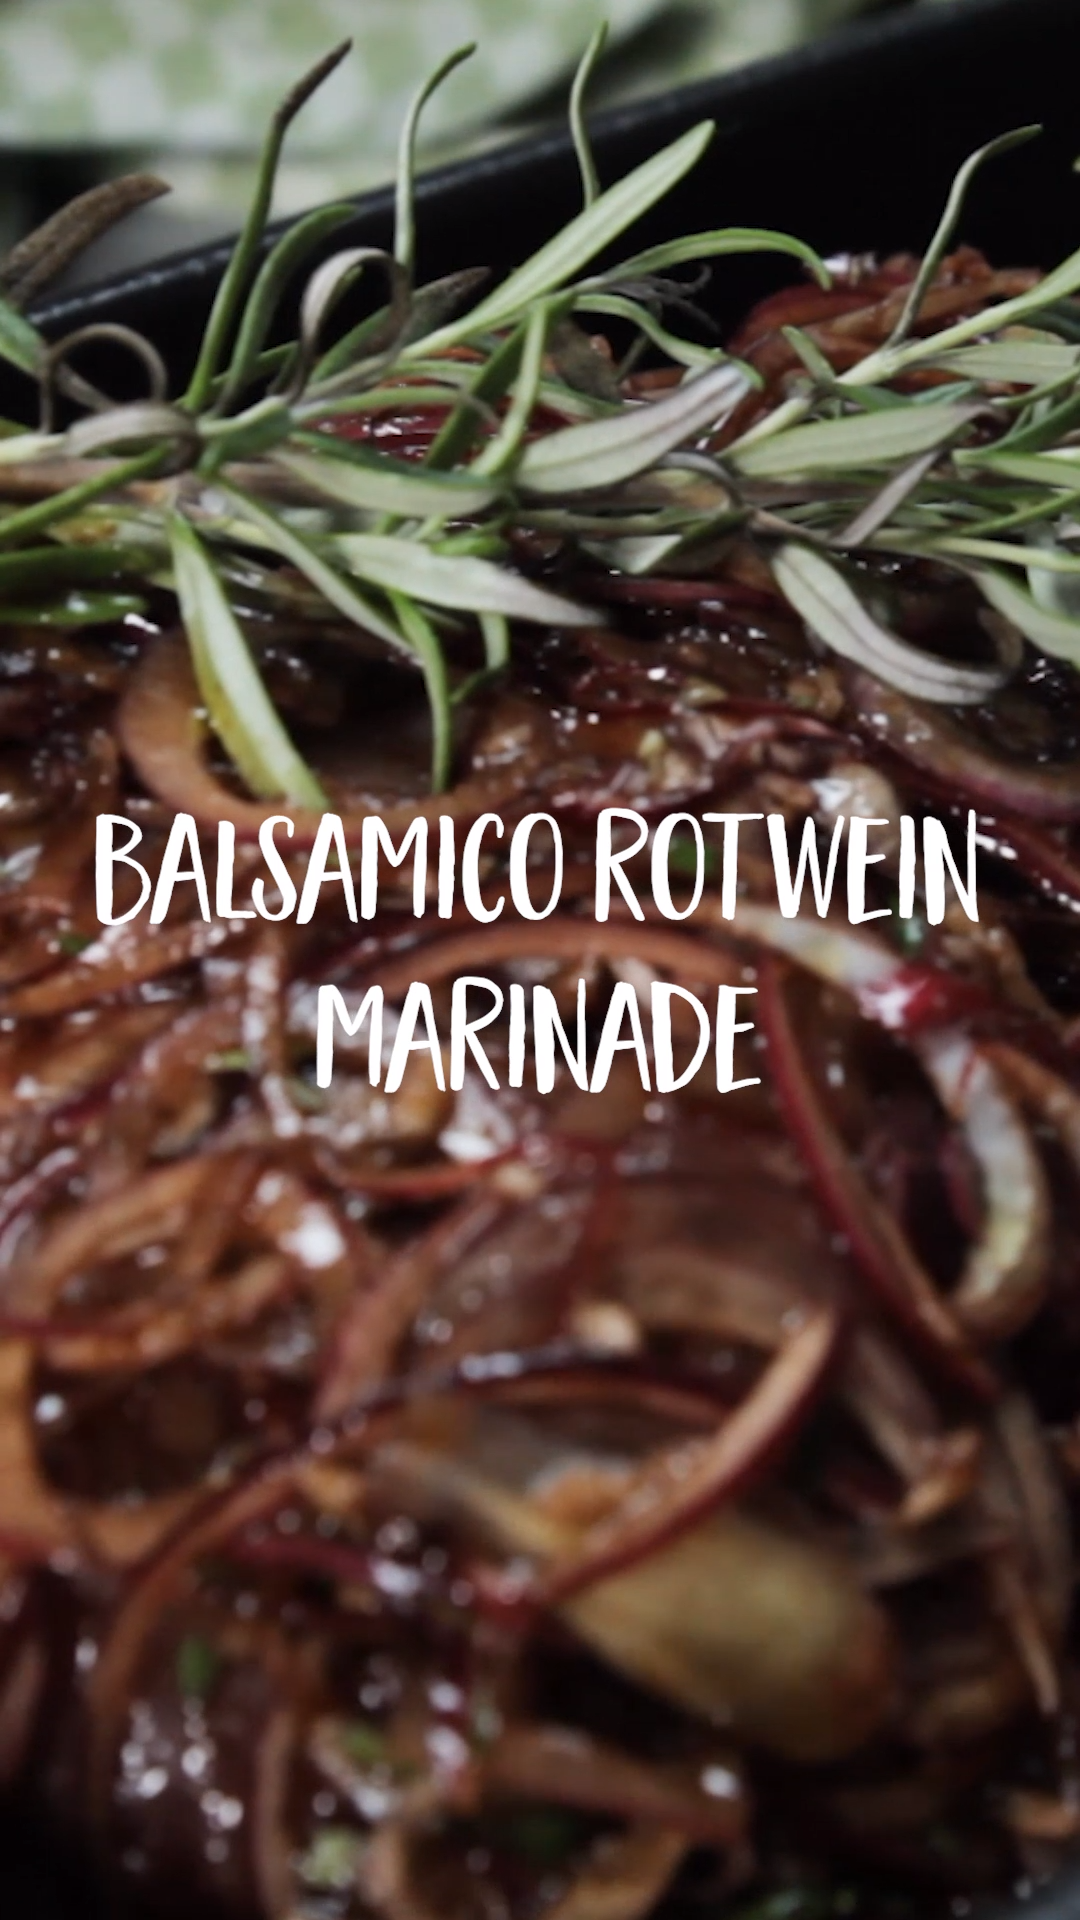 Balsamico Rotwein Marinade